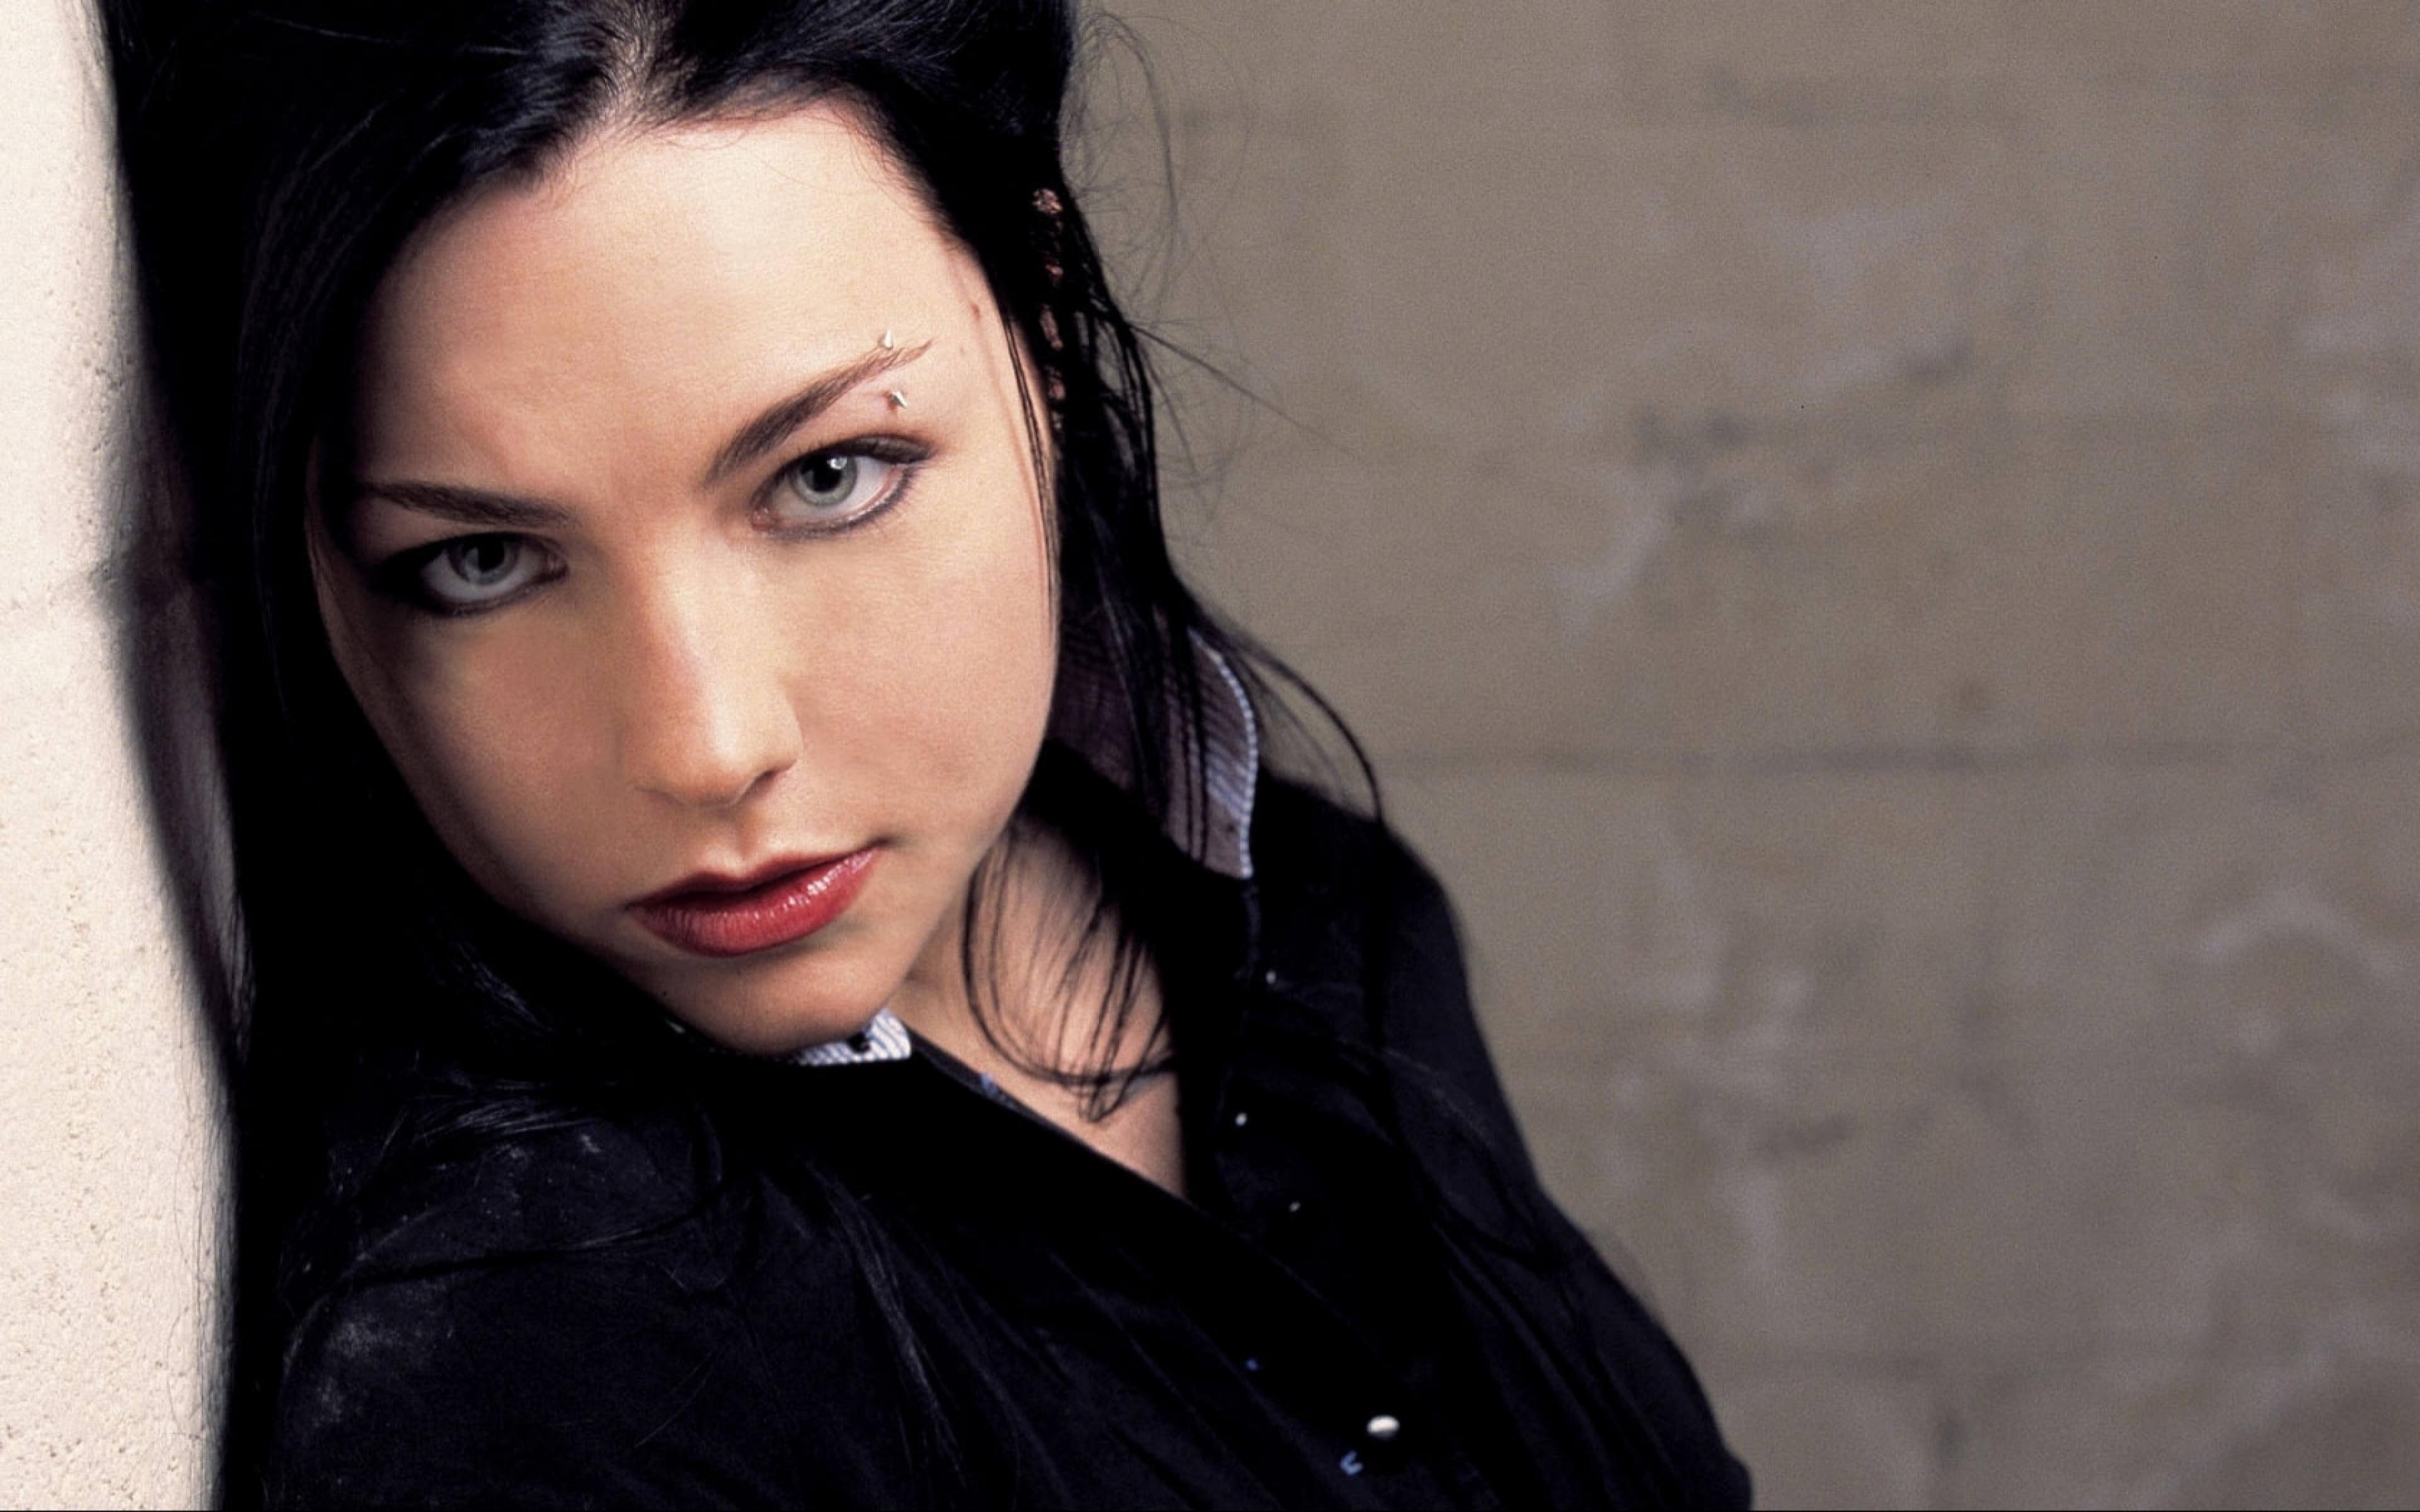 Music Quotes Wallpaper Widescreen Evanescence Wallpapers Hd Pixelstalk Net